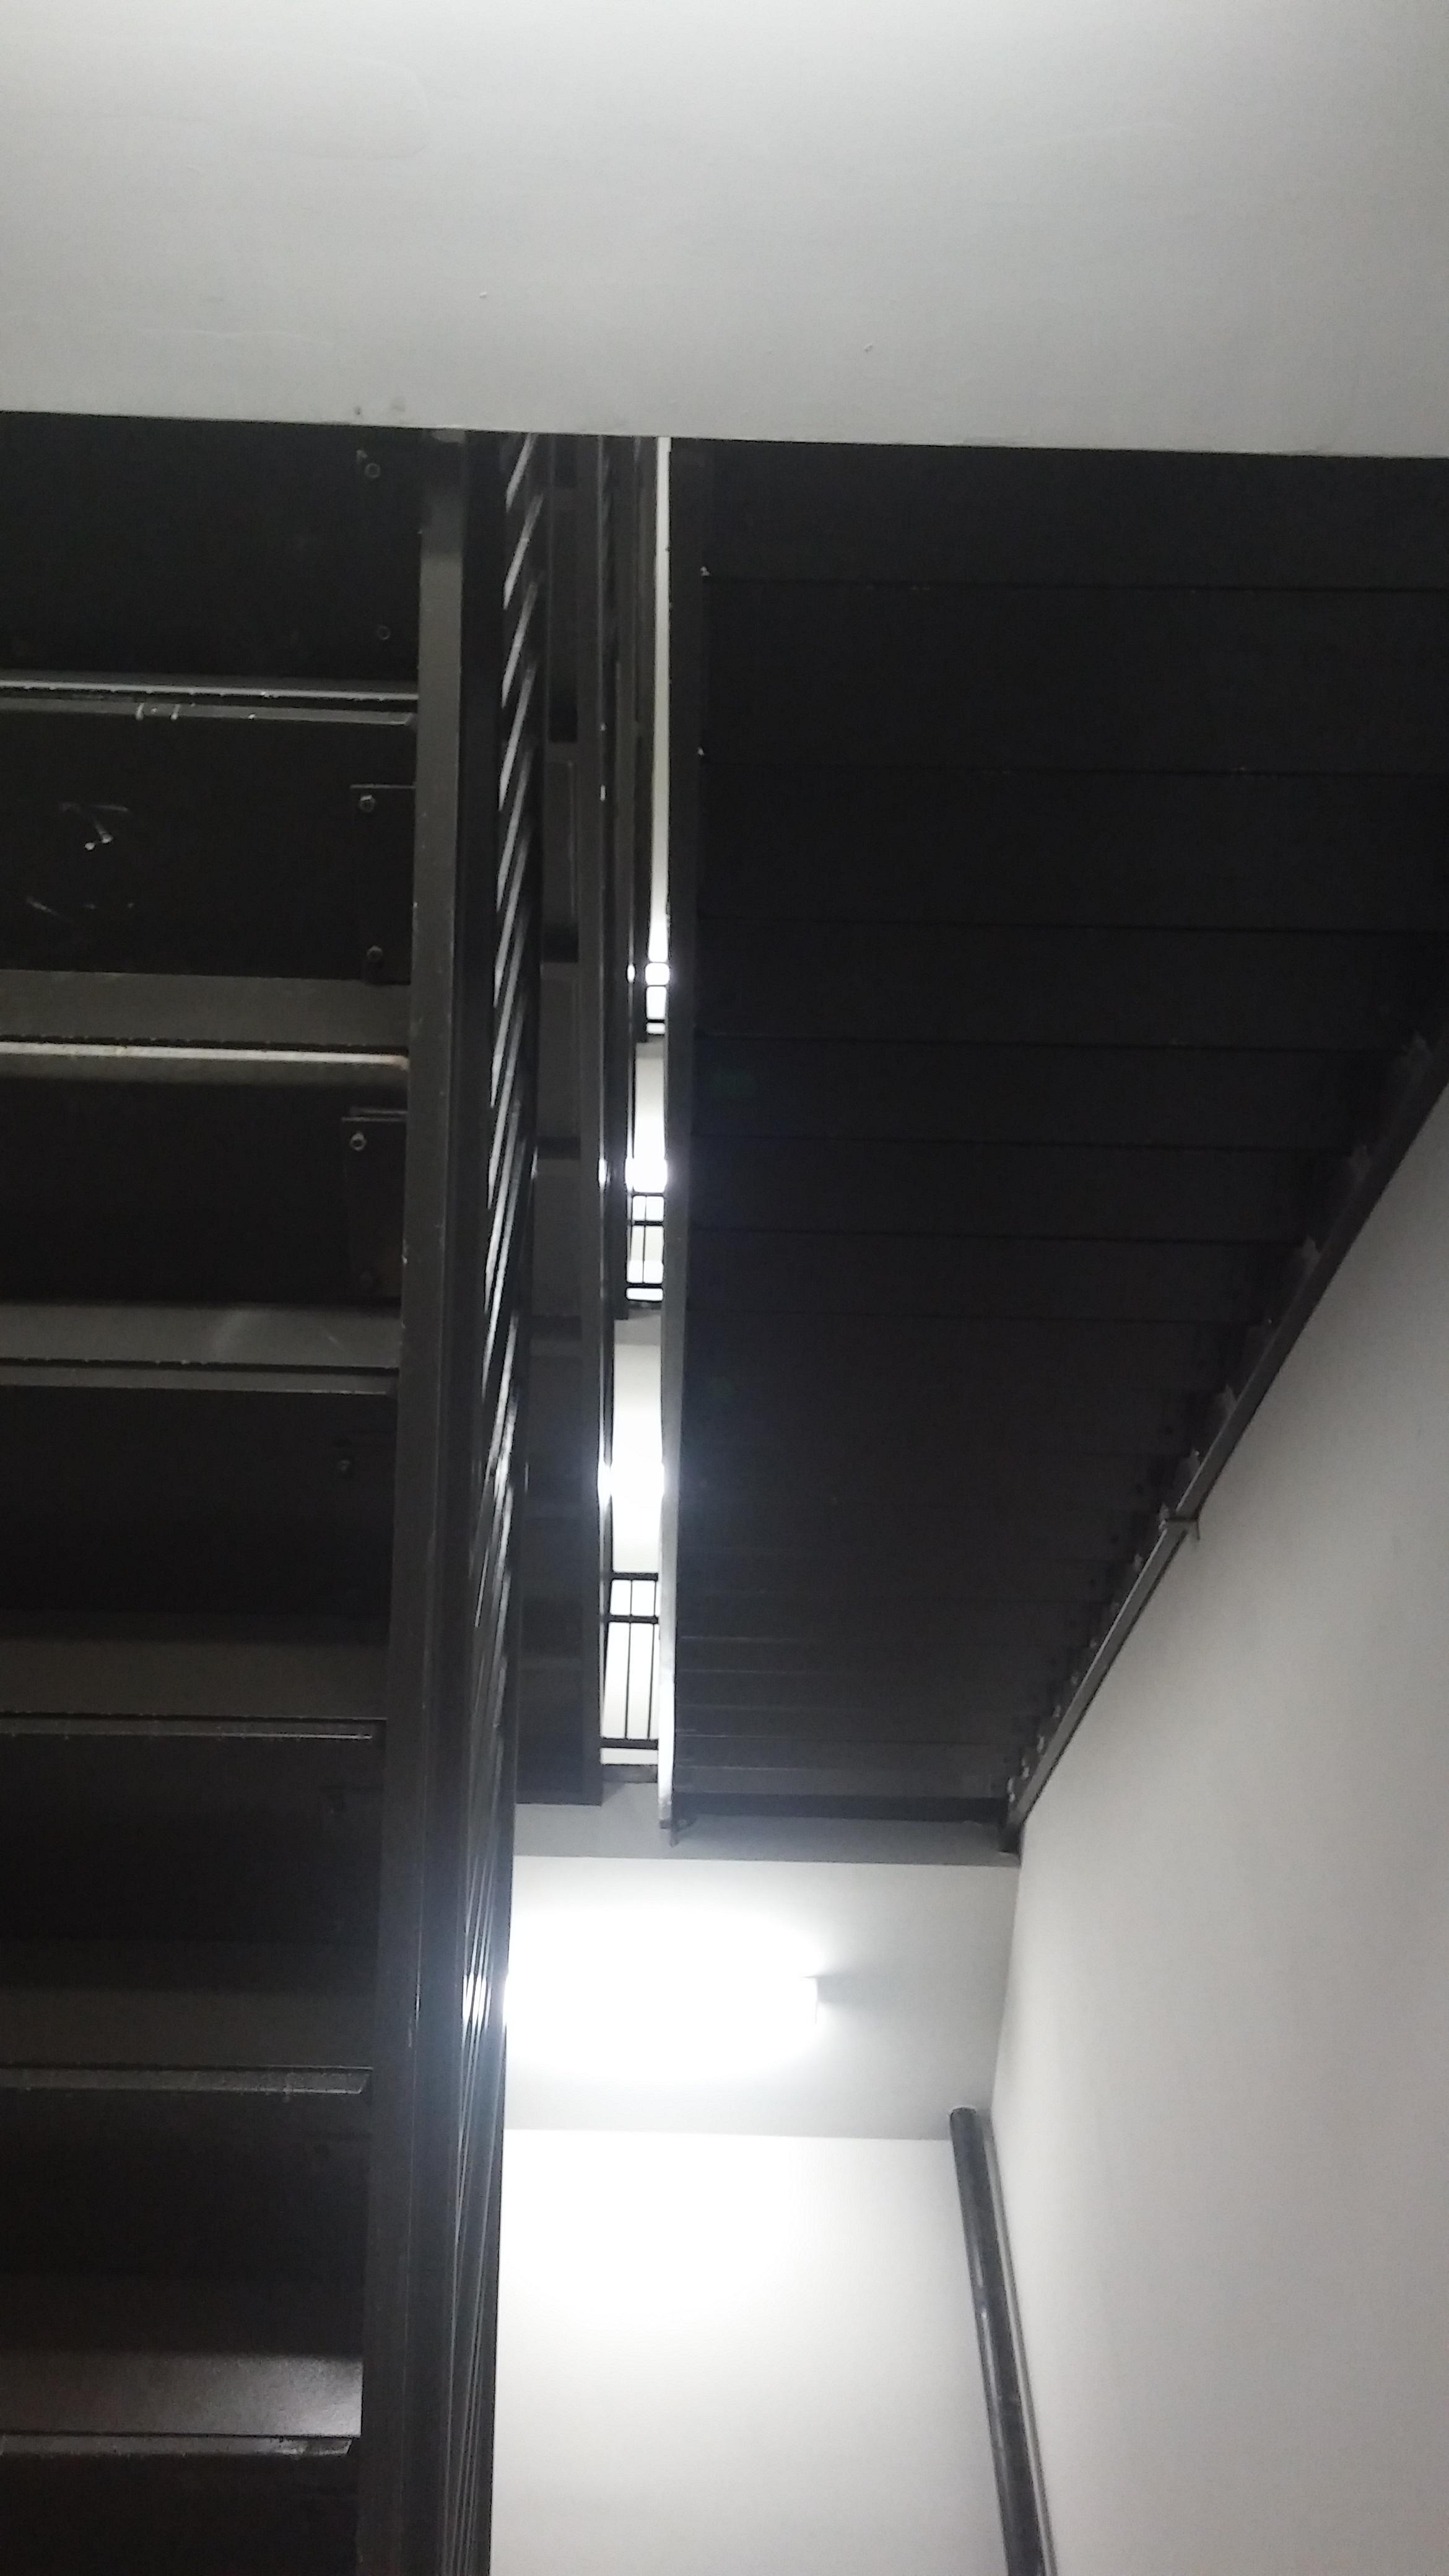 Stair remediation work-20160829_111102_1472657049715.jpg